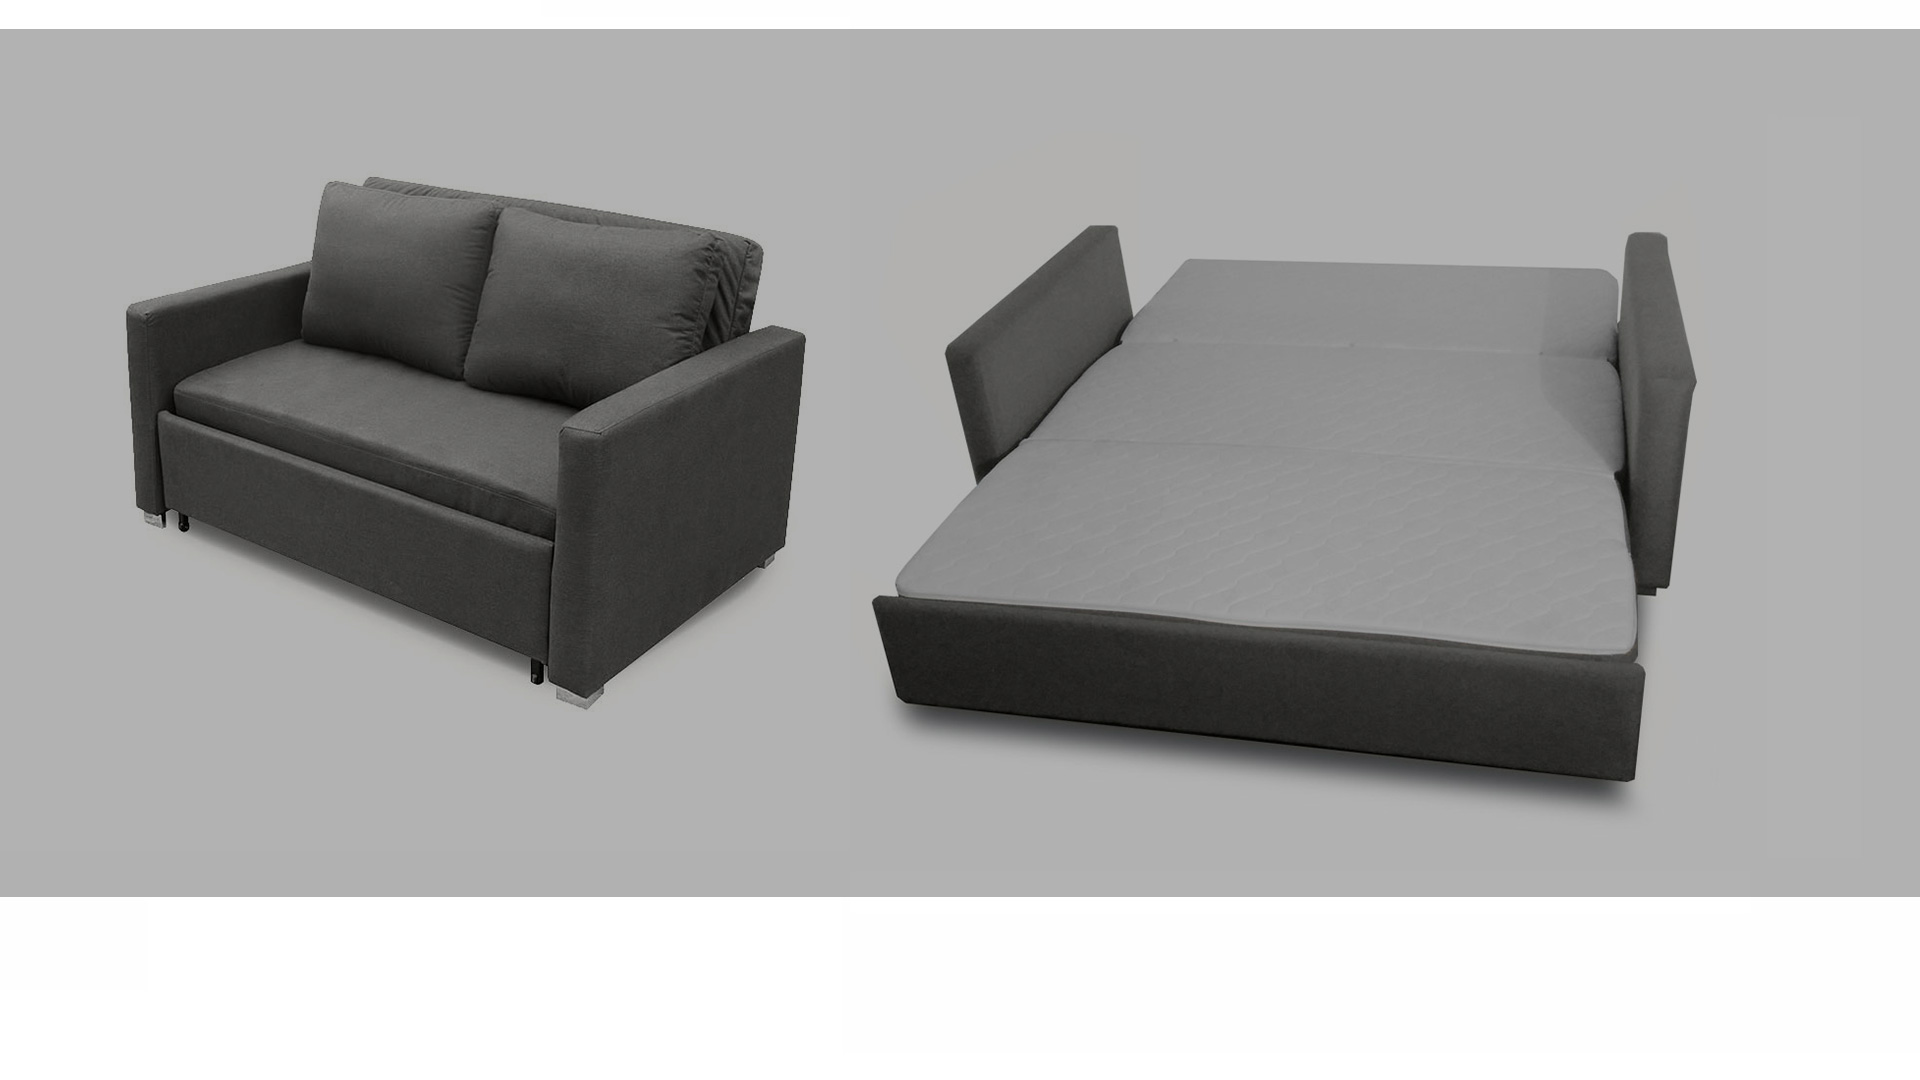 duo modern sofa bed sleeper small fabric corner uk space saver home the honoroak